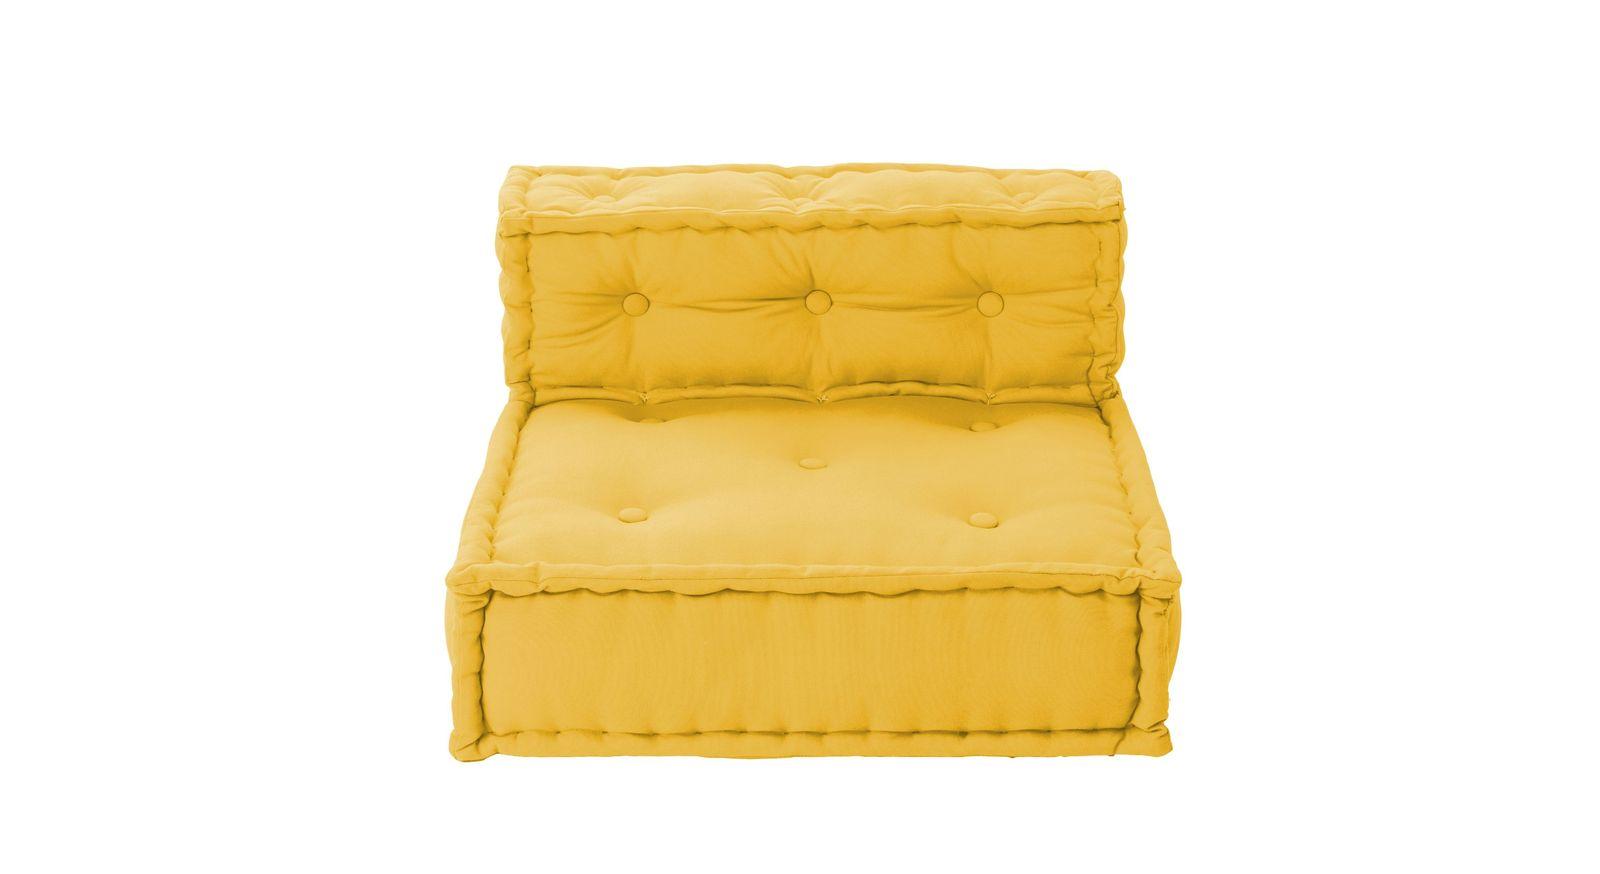 Gelbes Sitzkissen-Sofa Kids Paradise mit Lehne